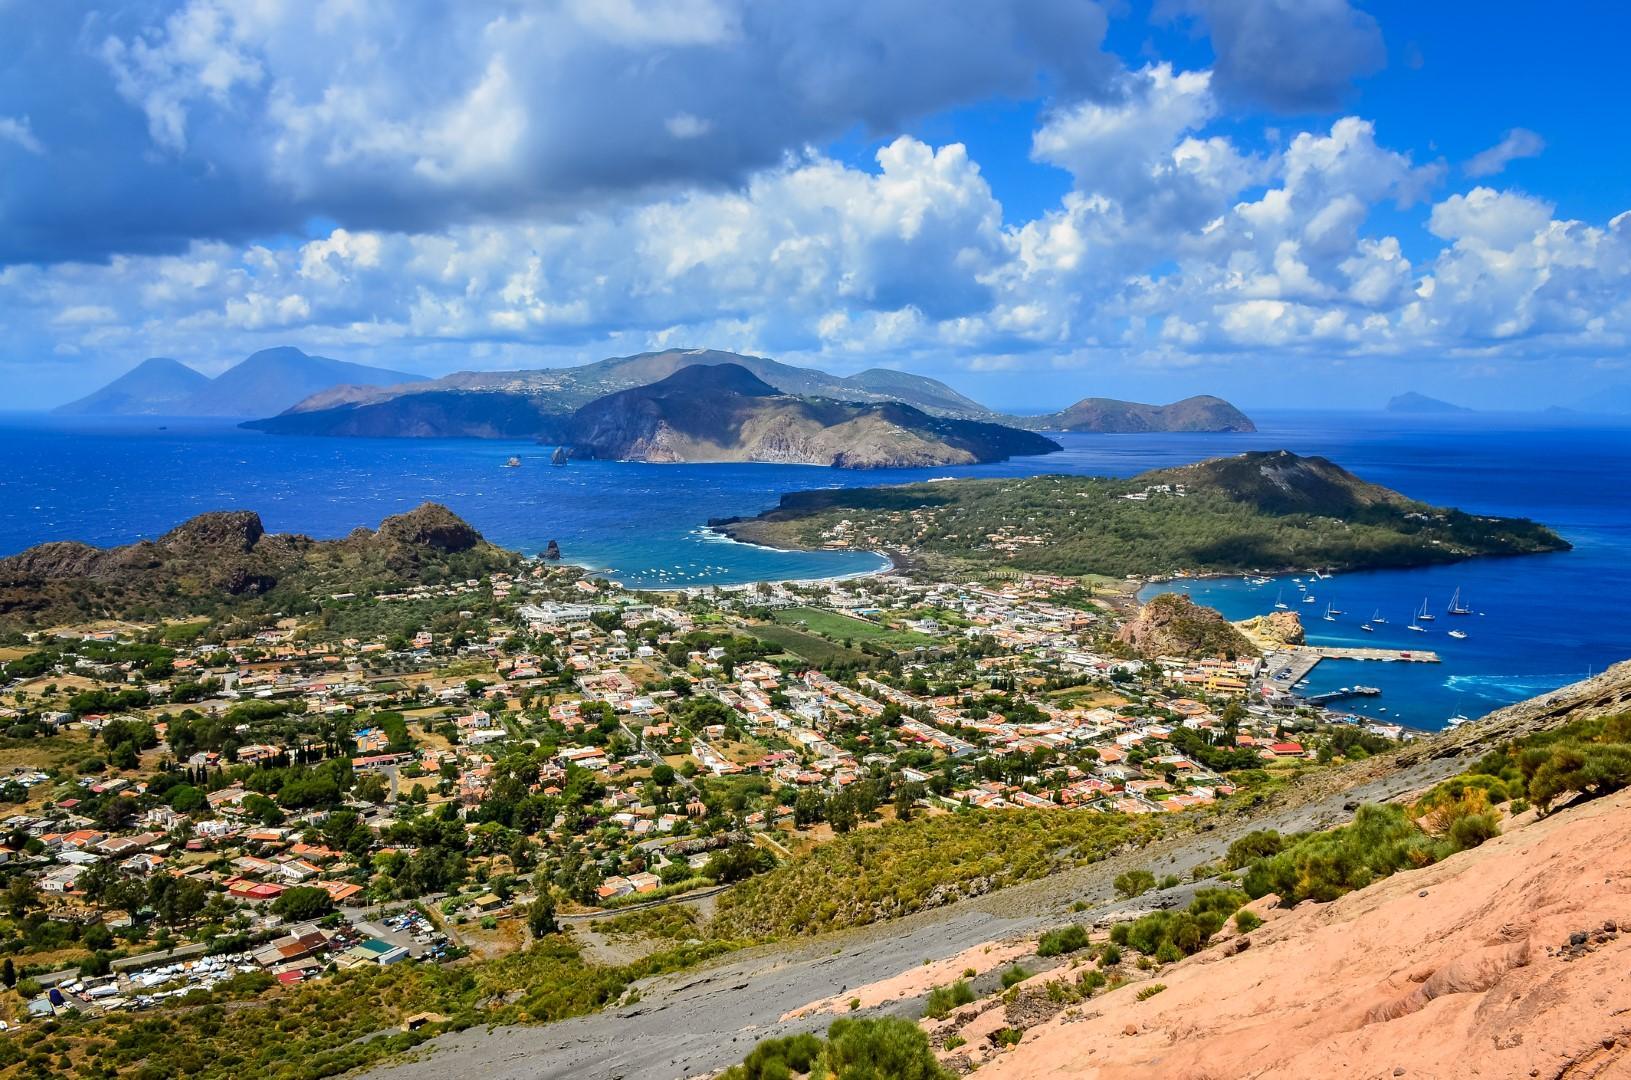 Una magnifica odissea tra le isole Eolie